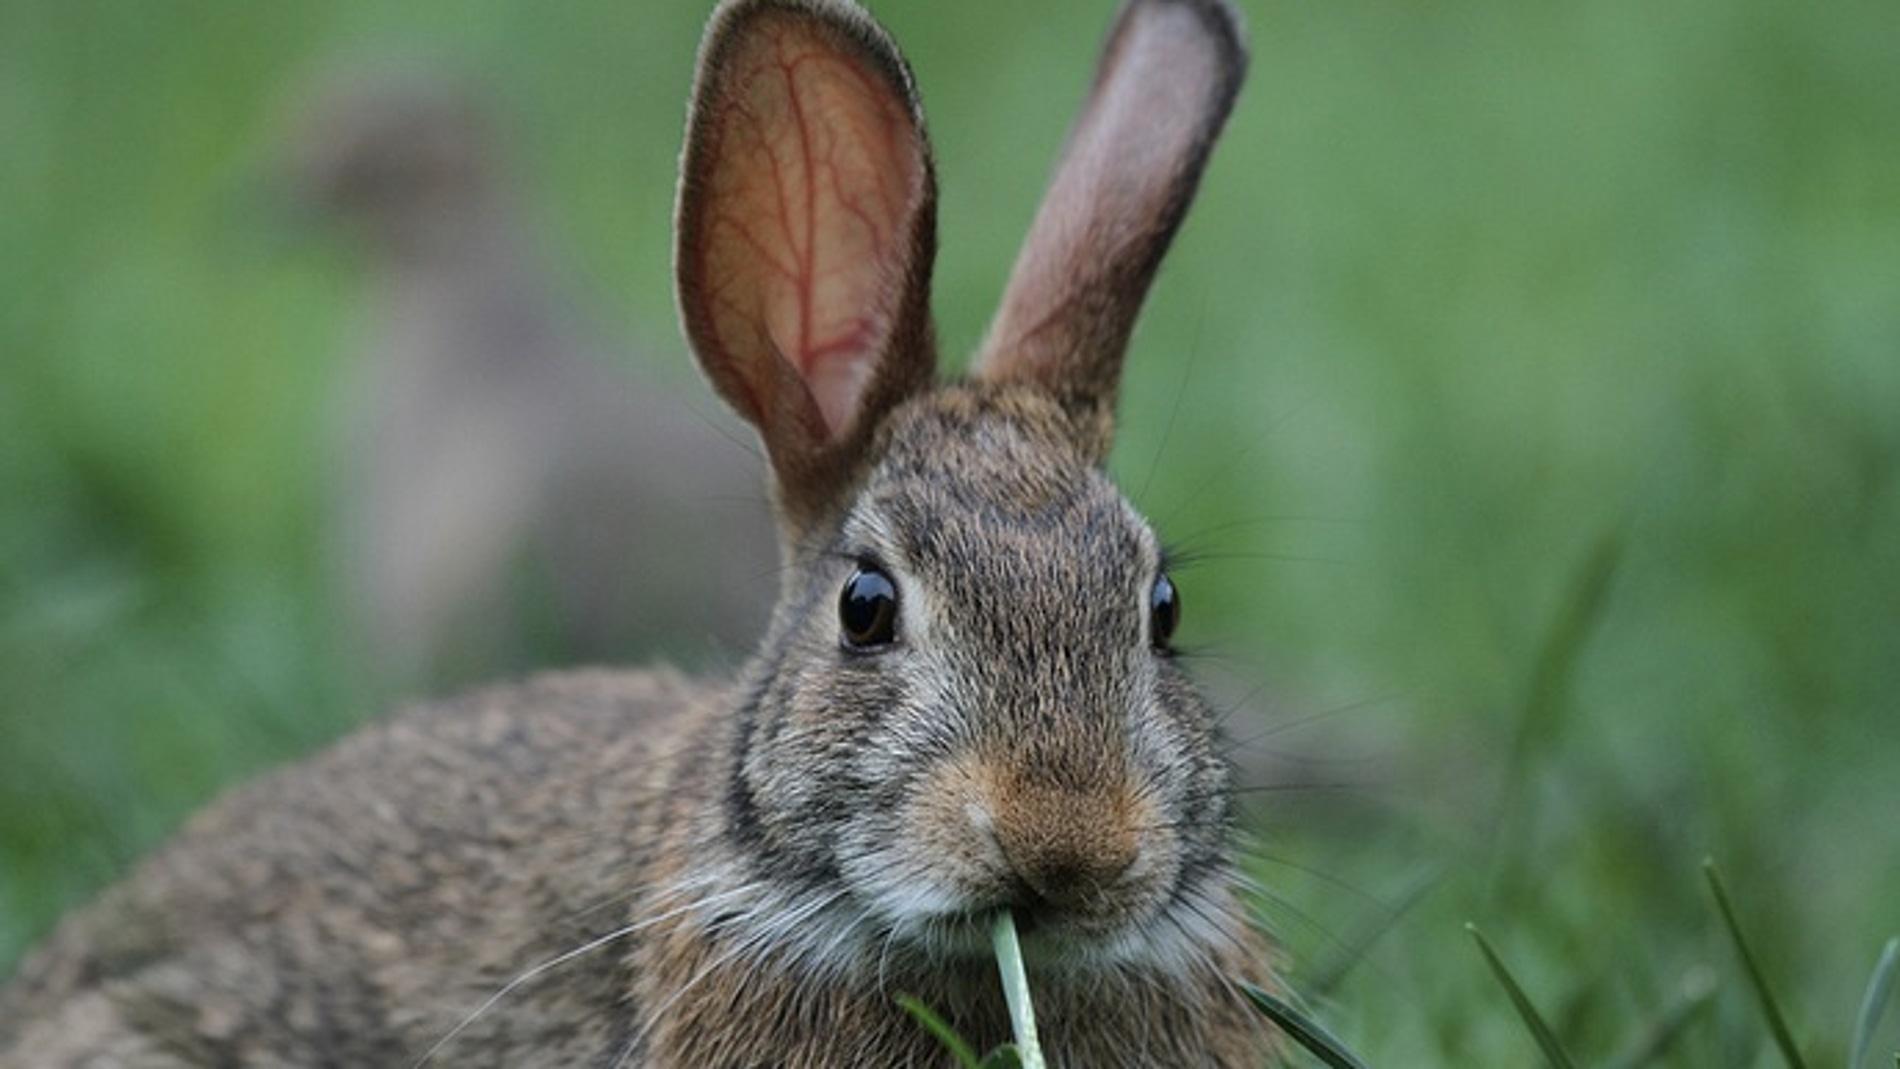 Un ejemplar de conejo silvestre